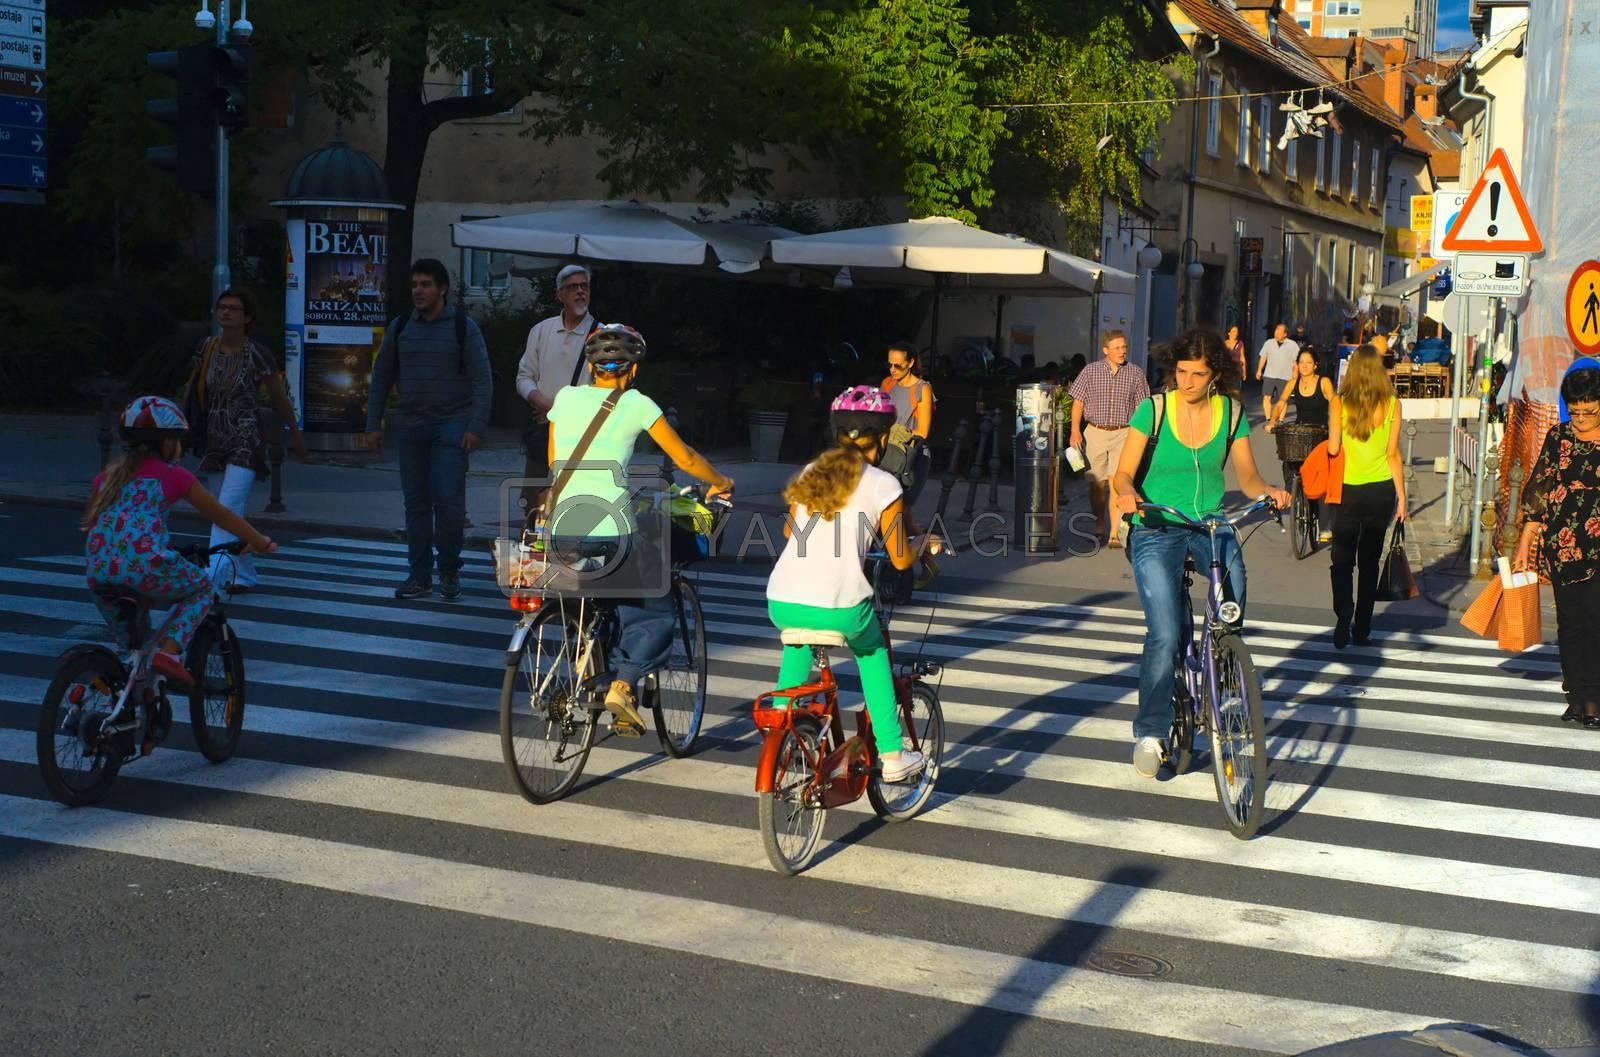 Royalty free image of People on the streets of Ljubljana, Slovenia by joyfull